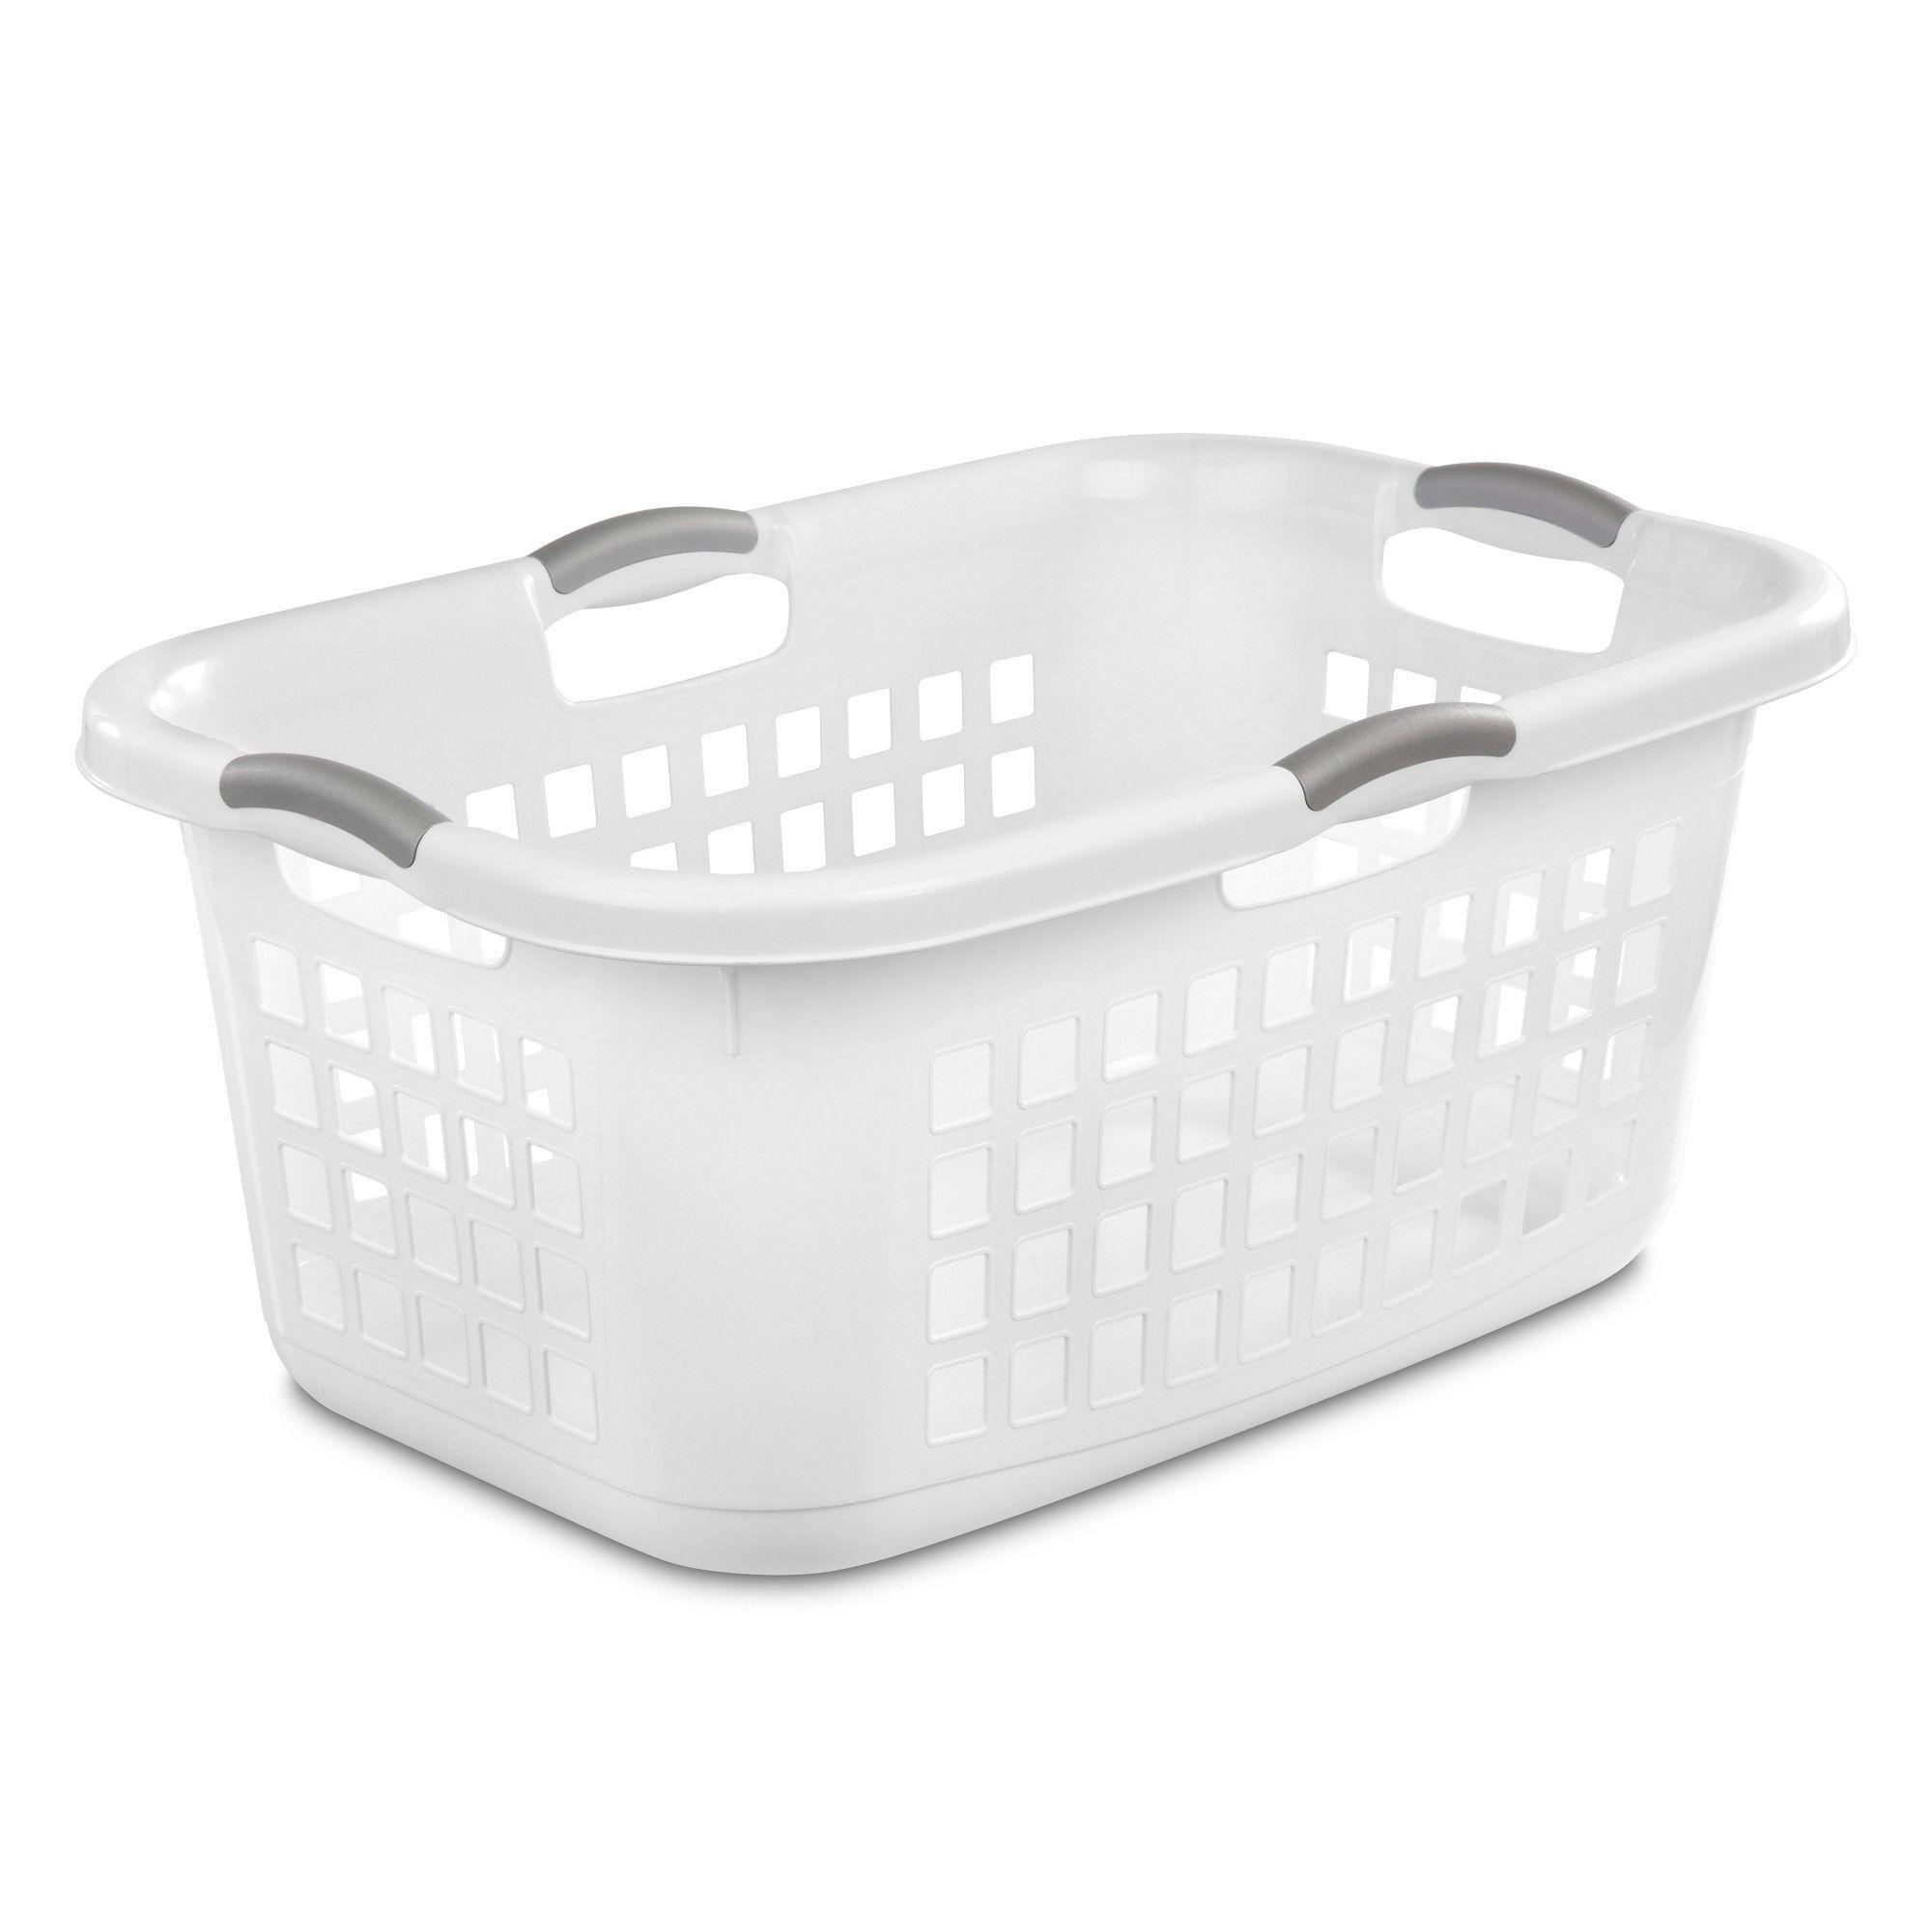 Sterilite 2 Bushel Capacity Single Laundry Basket White Laundry Basket Laundry Room Essentials